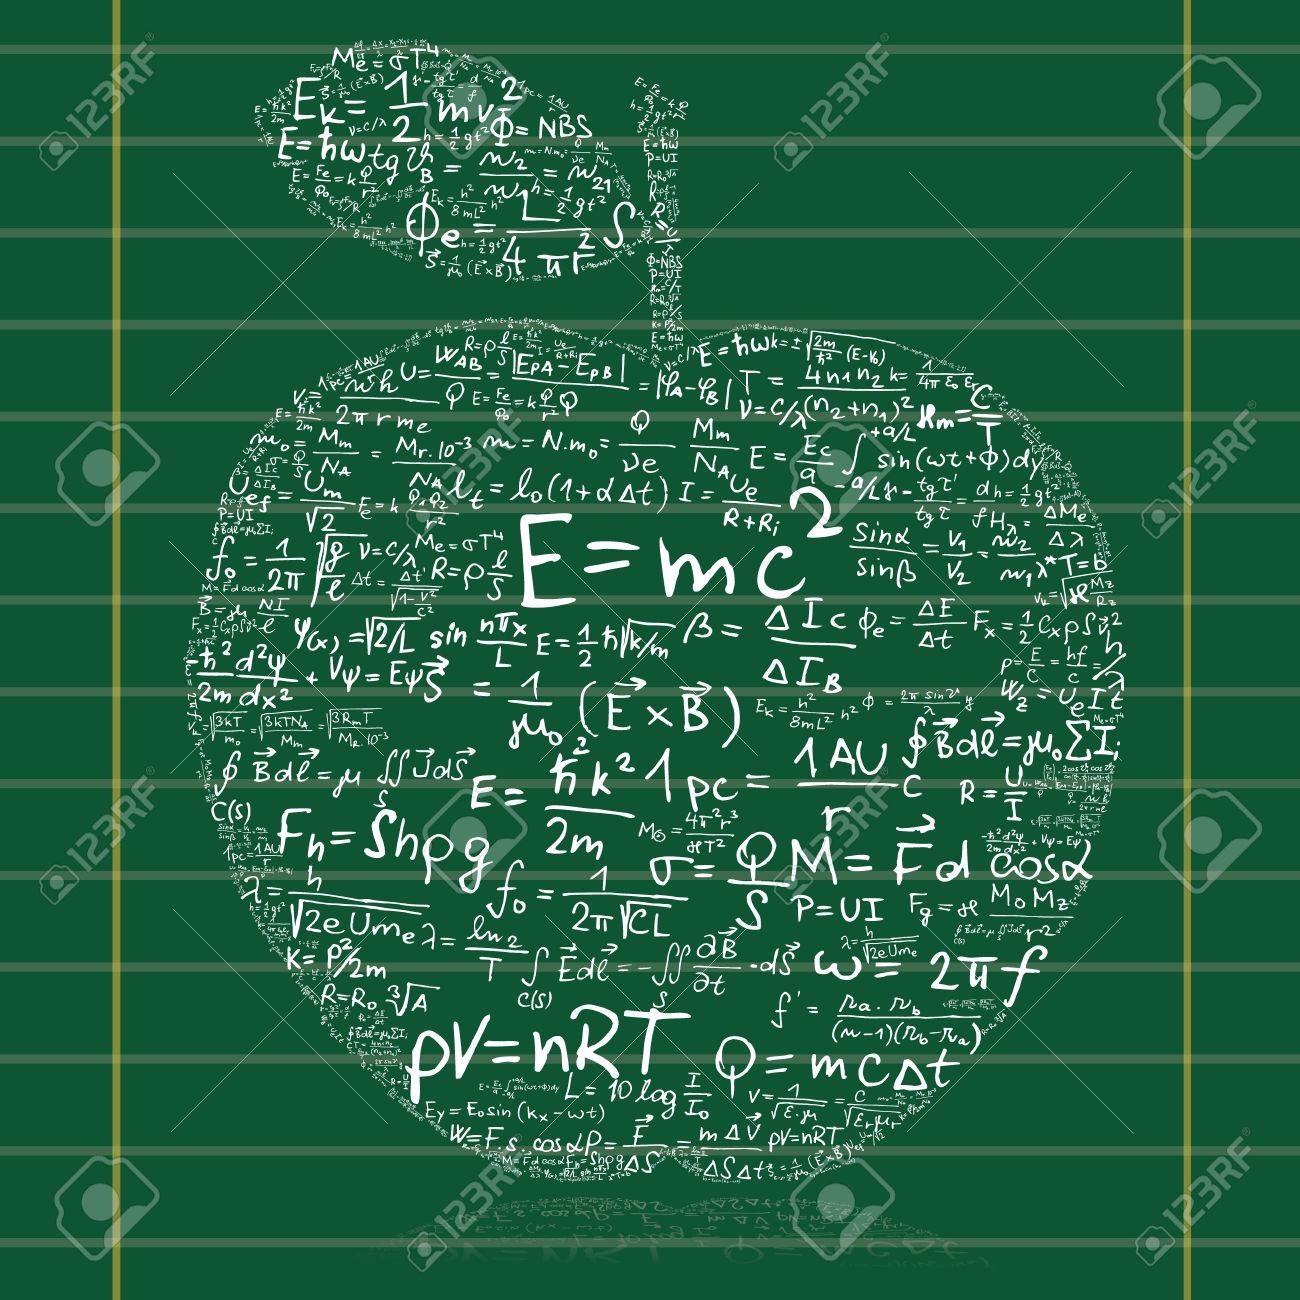 Clipart Blackboard Formulas.